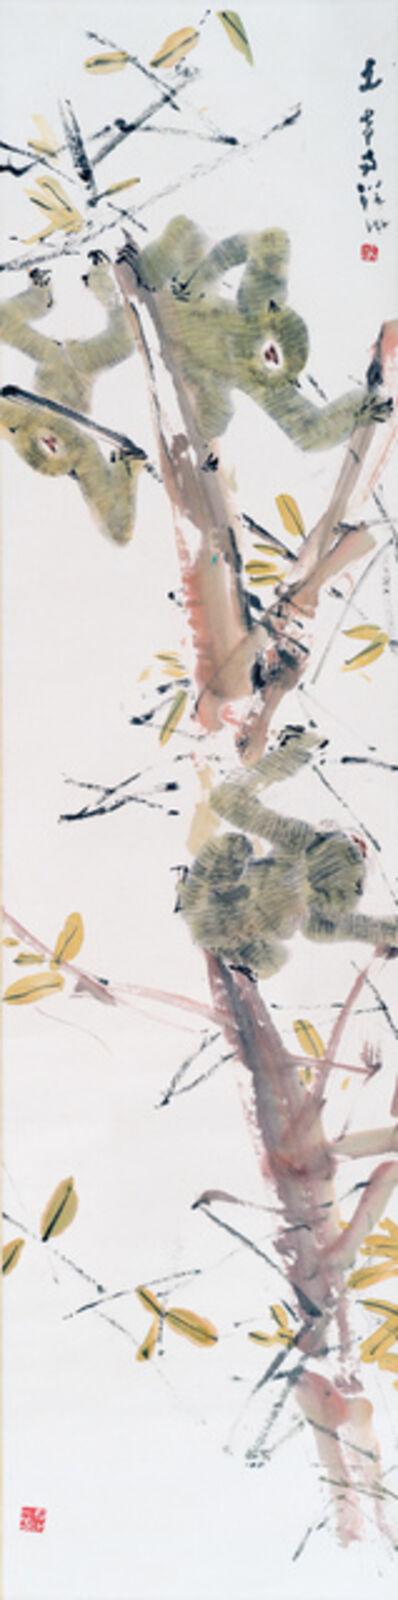 Chen Wen Hsi, 'Gibbons'